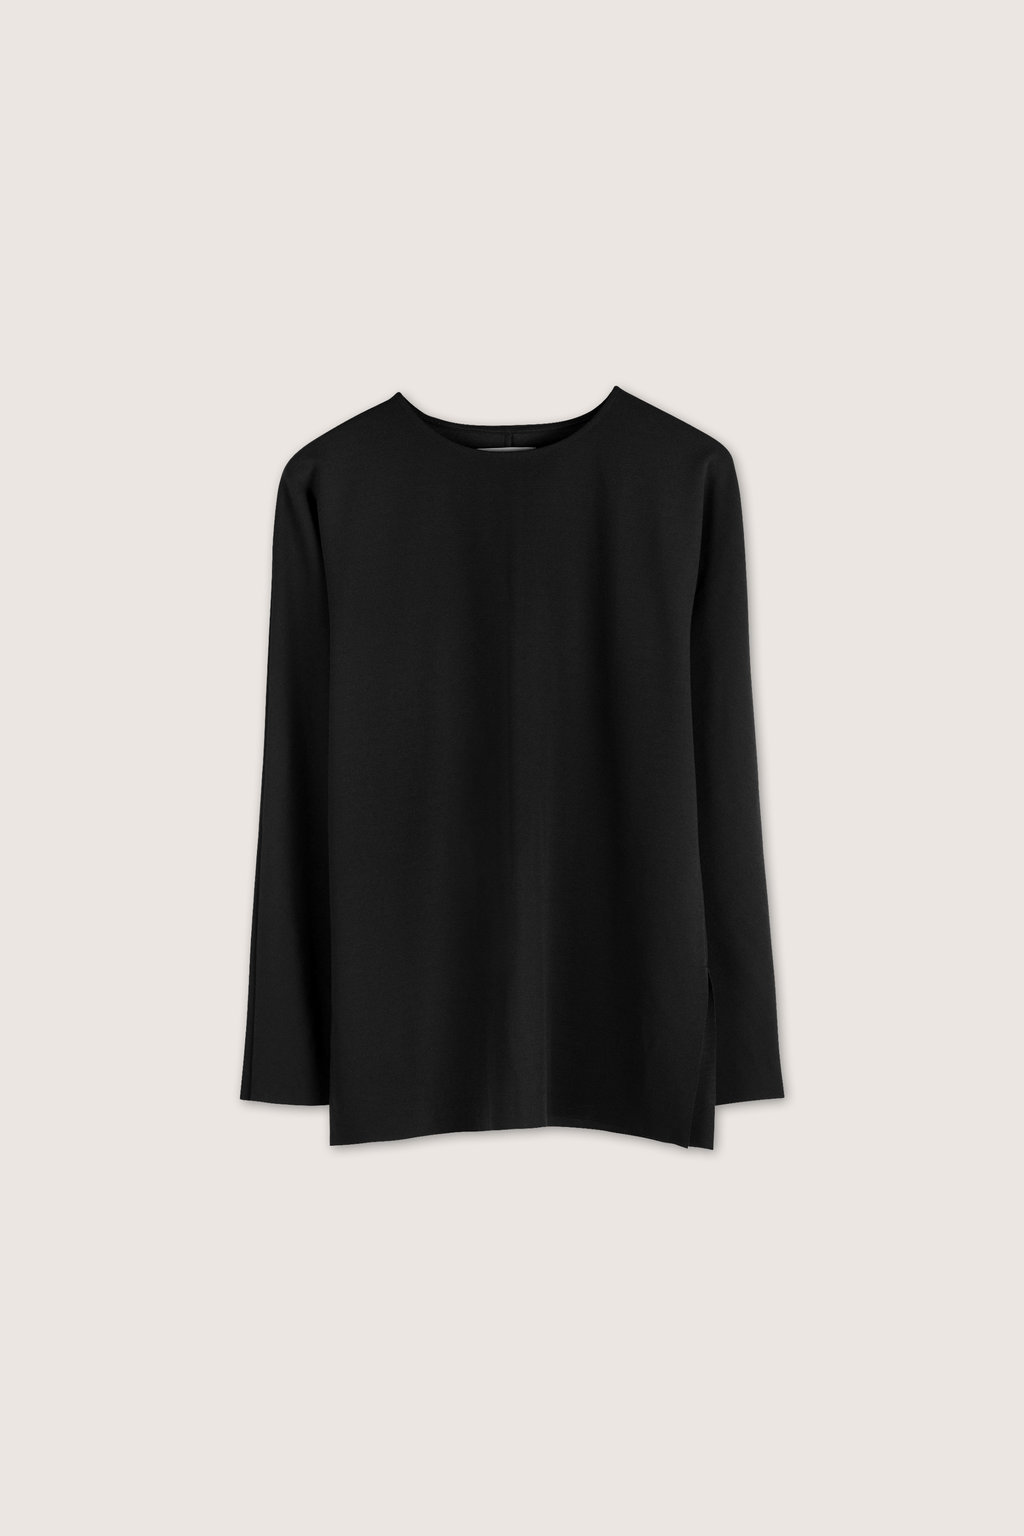 Blouse 1665 Black 14